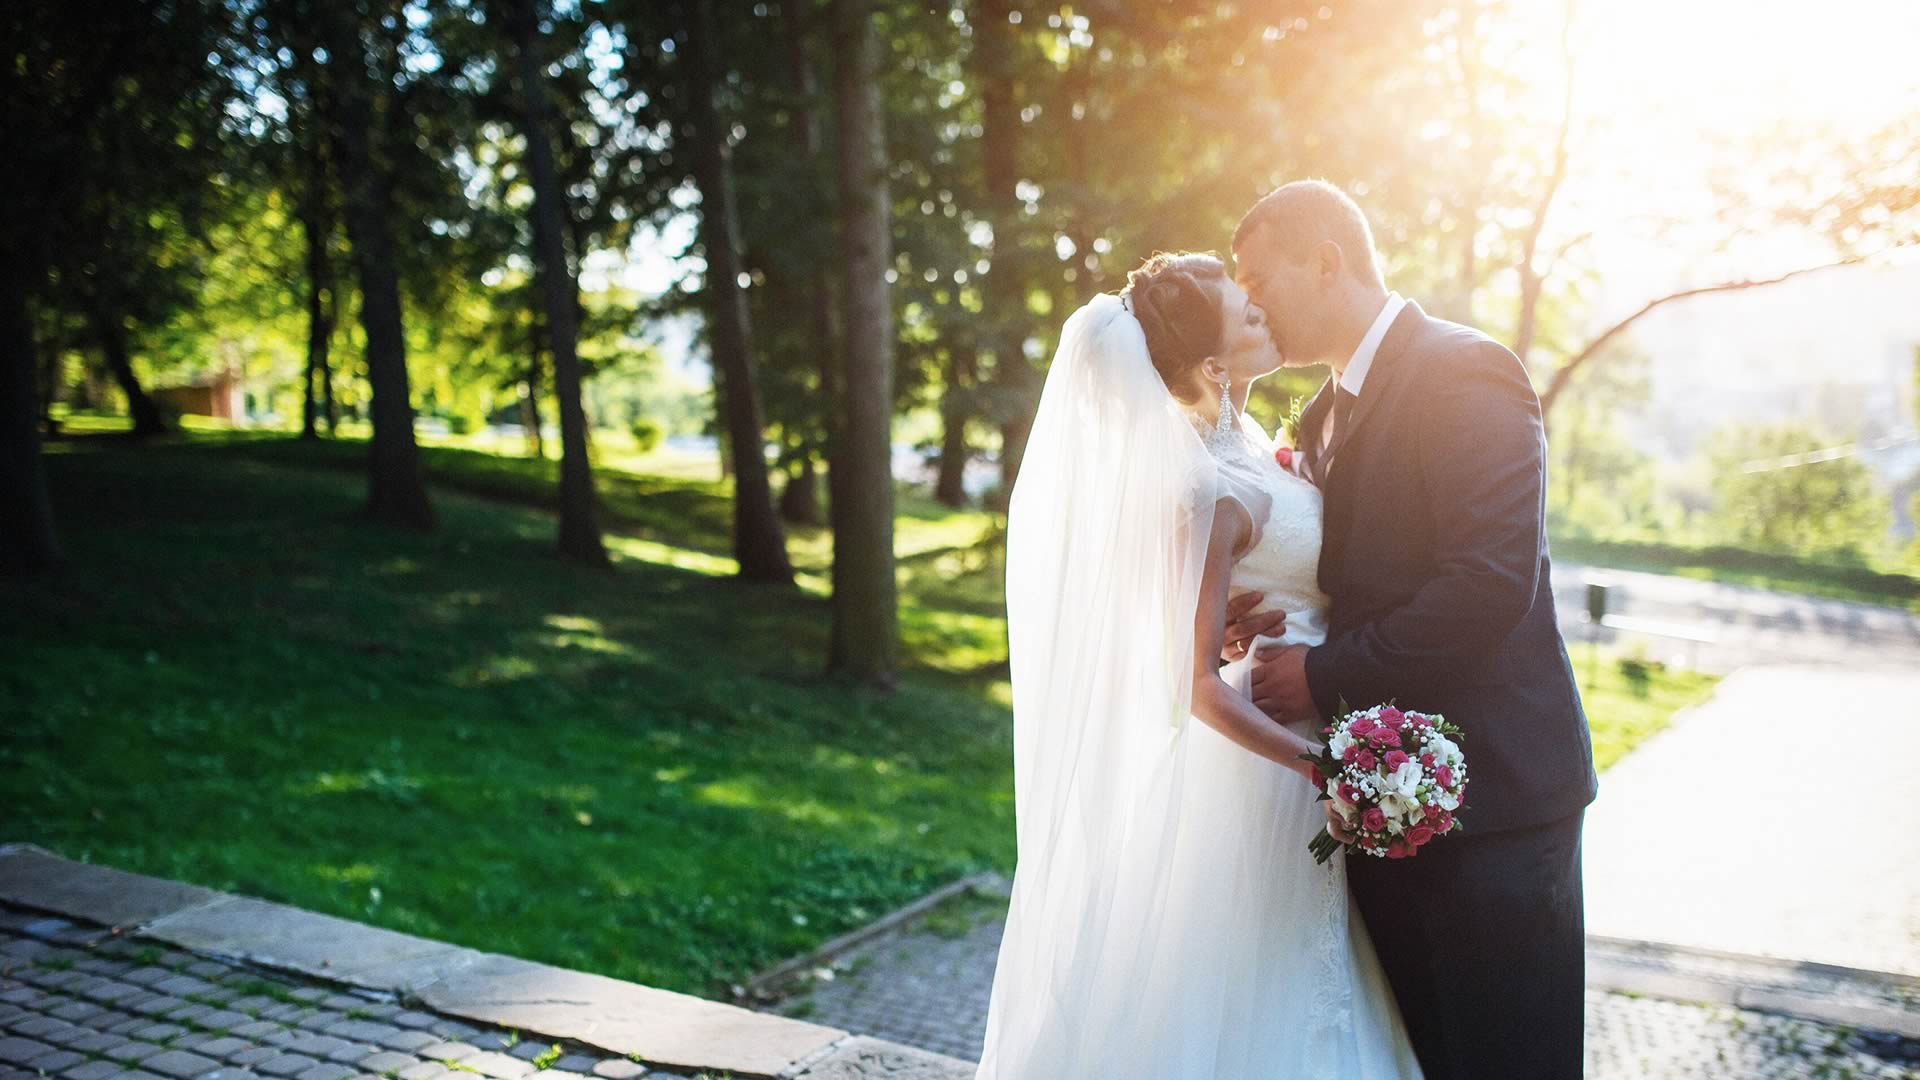 Nashville TN wedding officiants Sensational Ceremonies